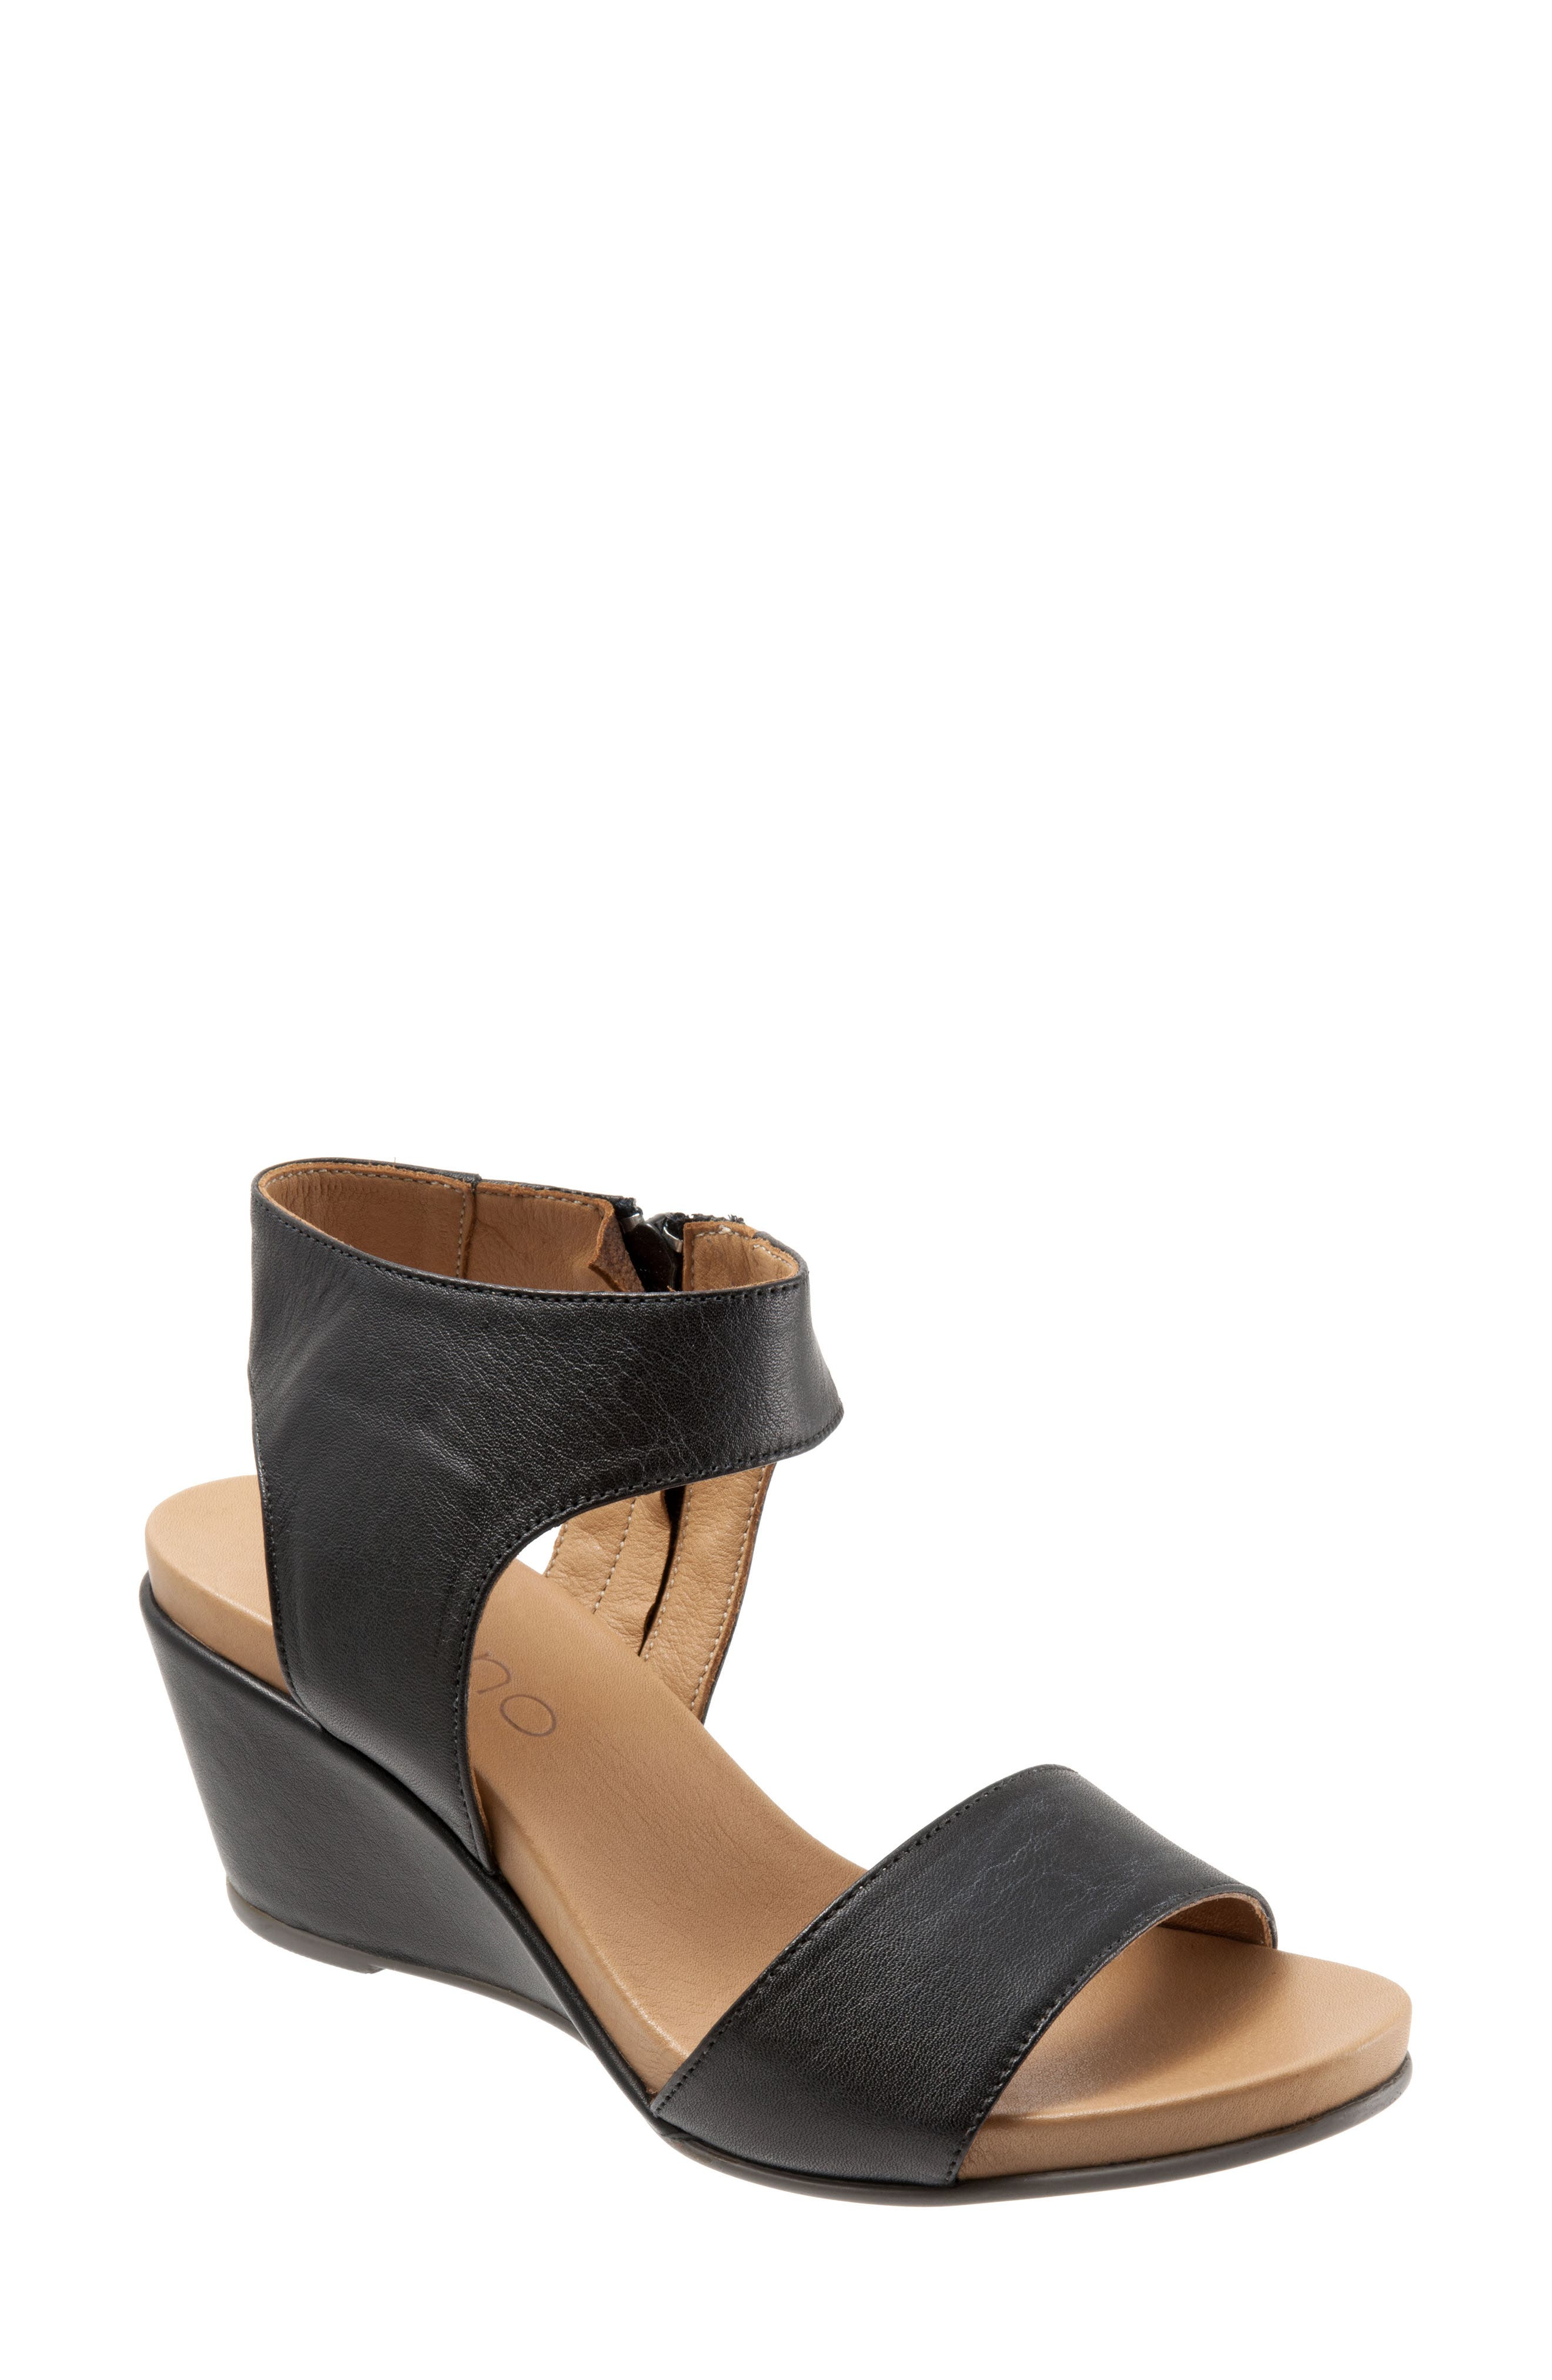 Ida Wedge Sandal,                         Main,                         color, BLACK LEATHER